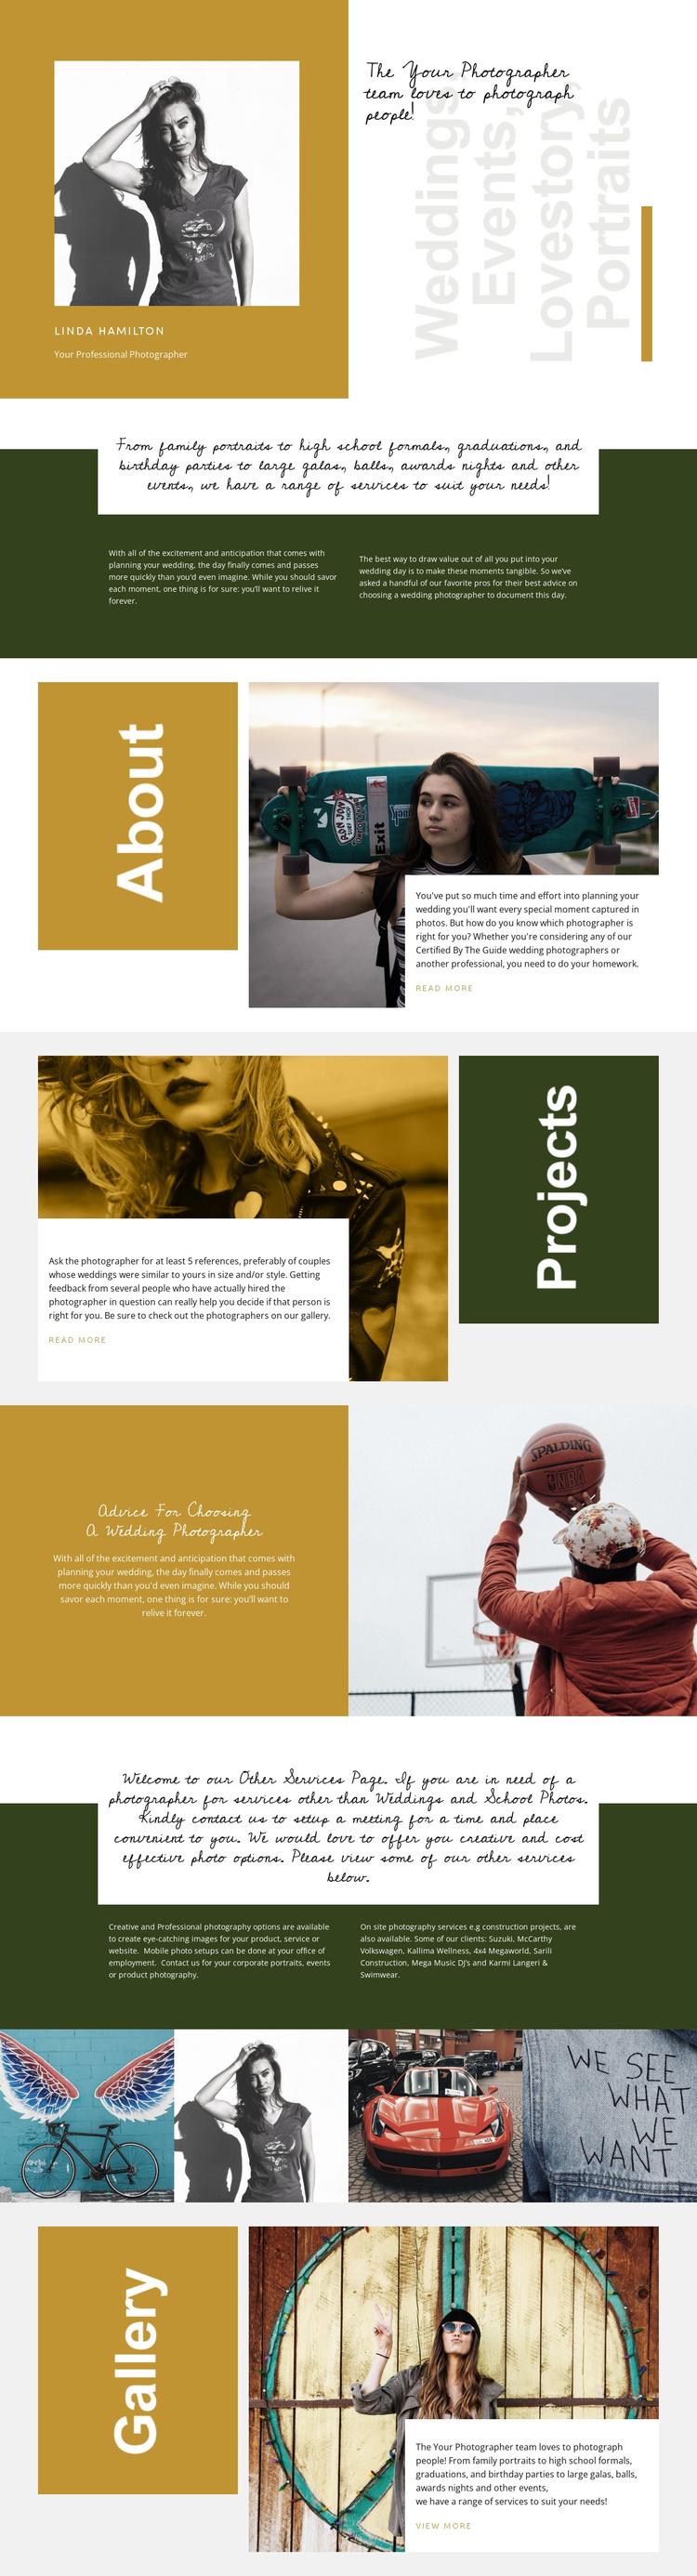 Fashion photography courses Joomla Template